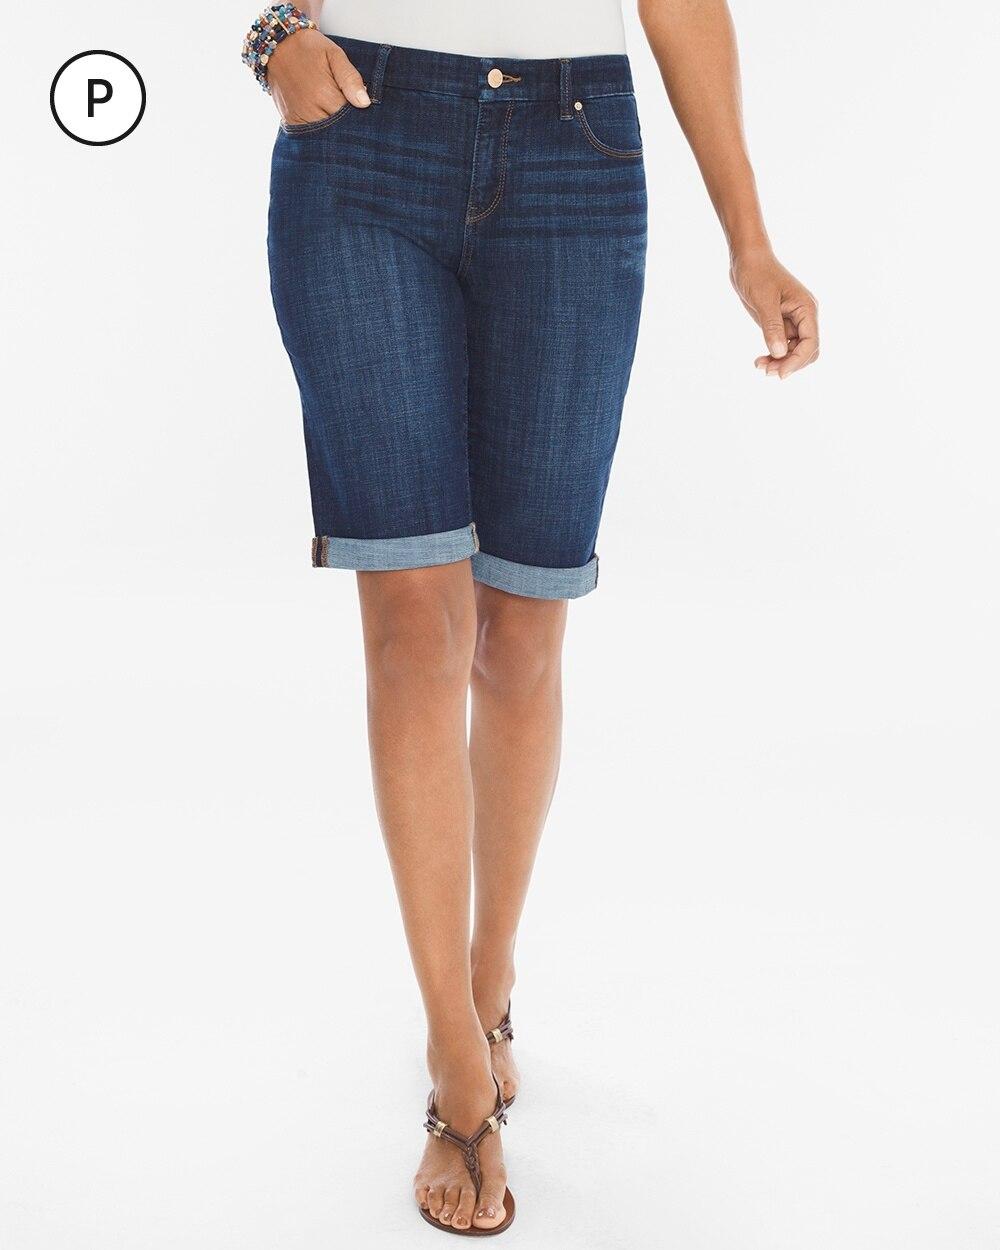 So Slimming Petite Girlfriend Shorts- 10.75 Inch Inseam